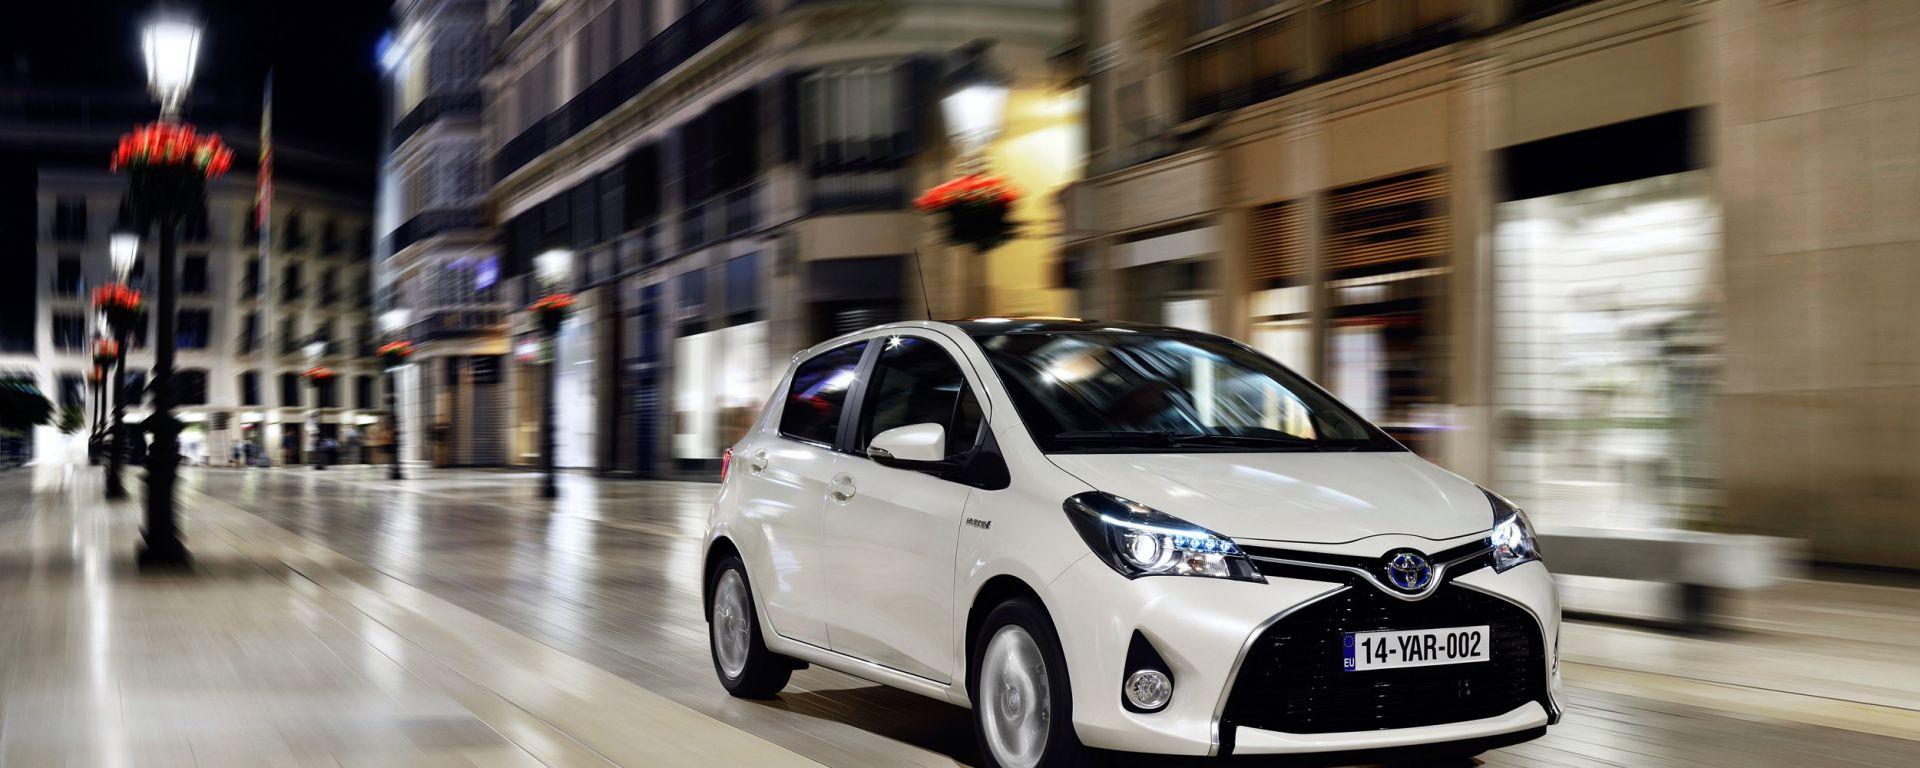 Europcar: boom per le ibride Toyota